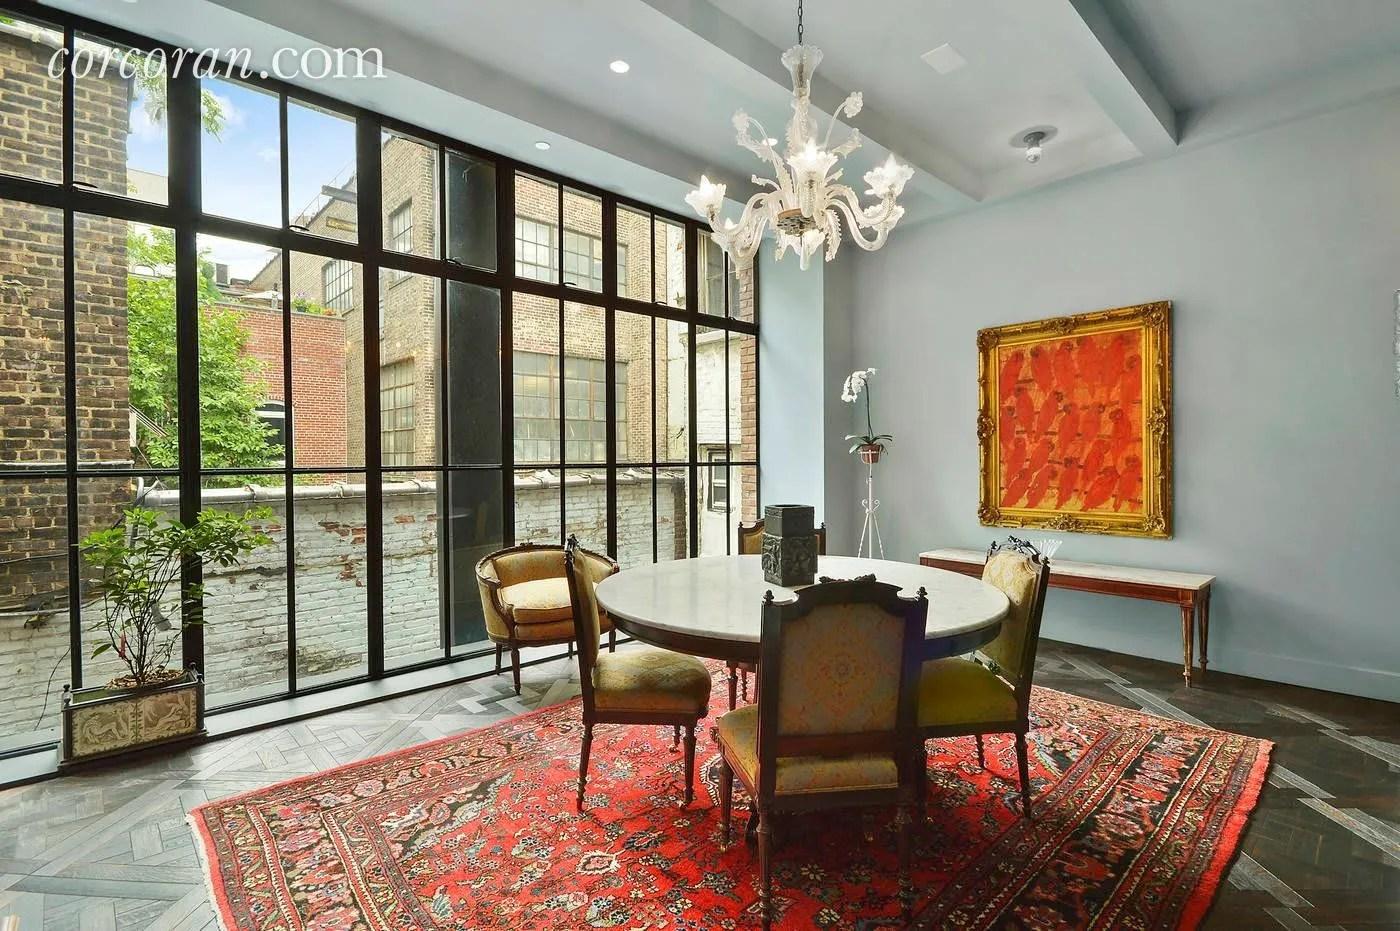 Buy The 245 Million New York City Townhouse Taylor Swift